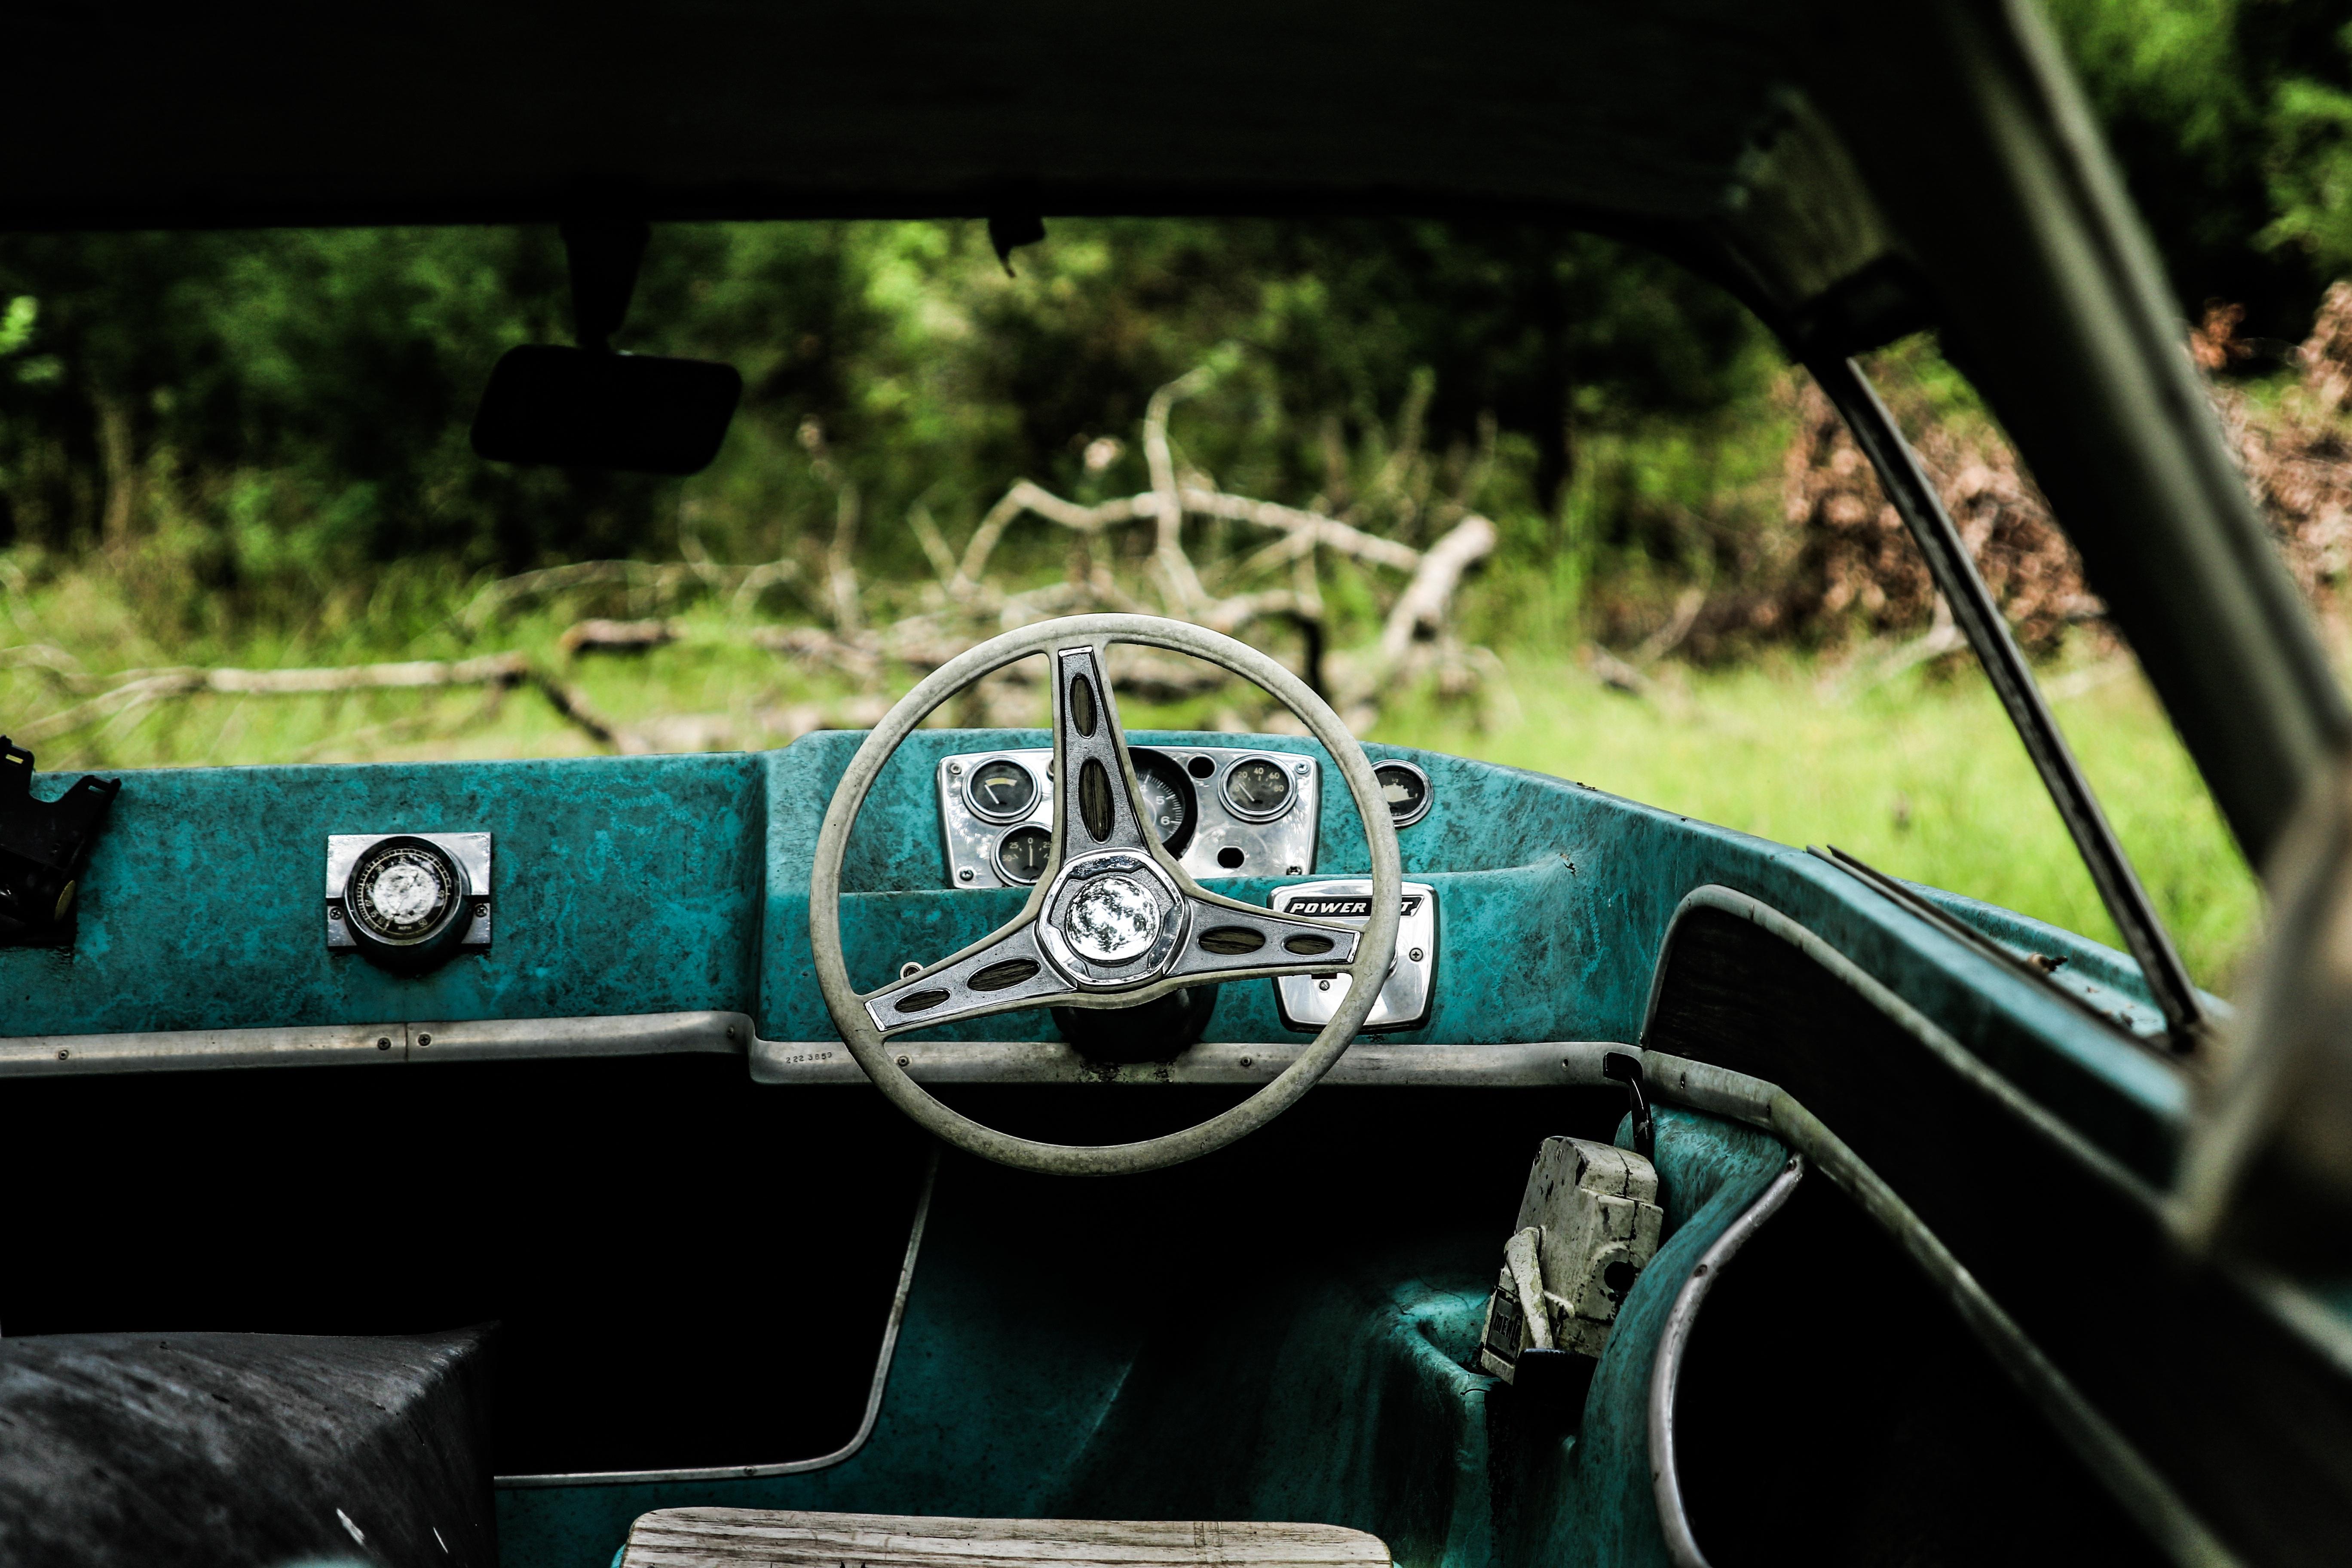 Free Images : transport, green, steering wheel, vintage car, retro ...